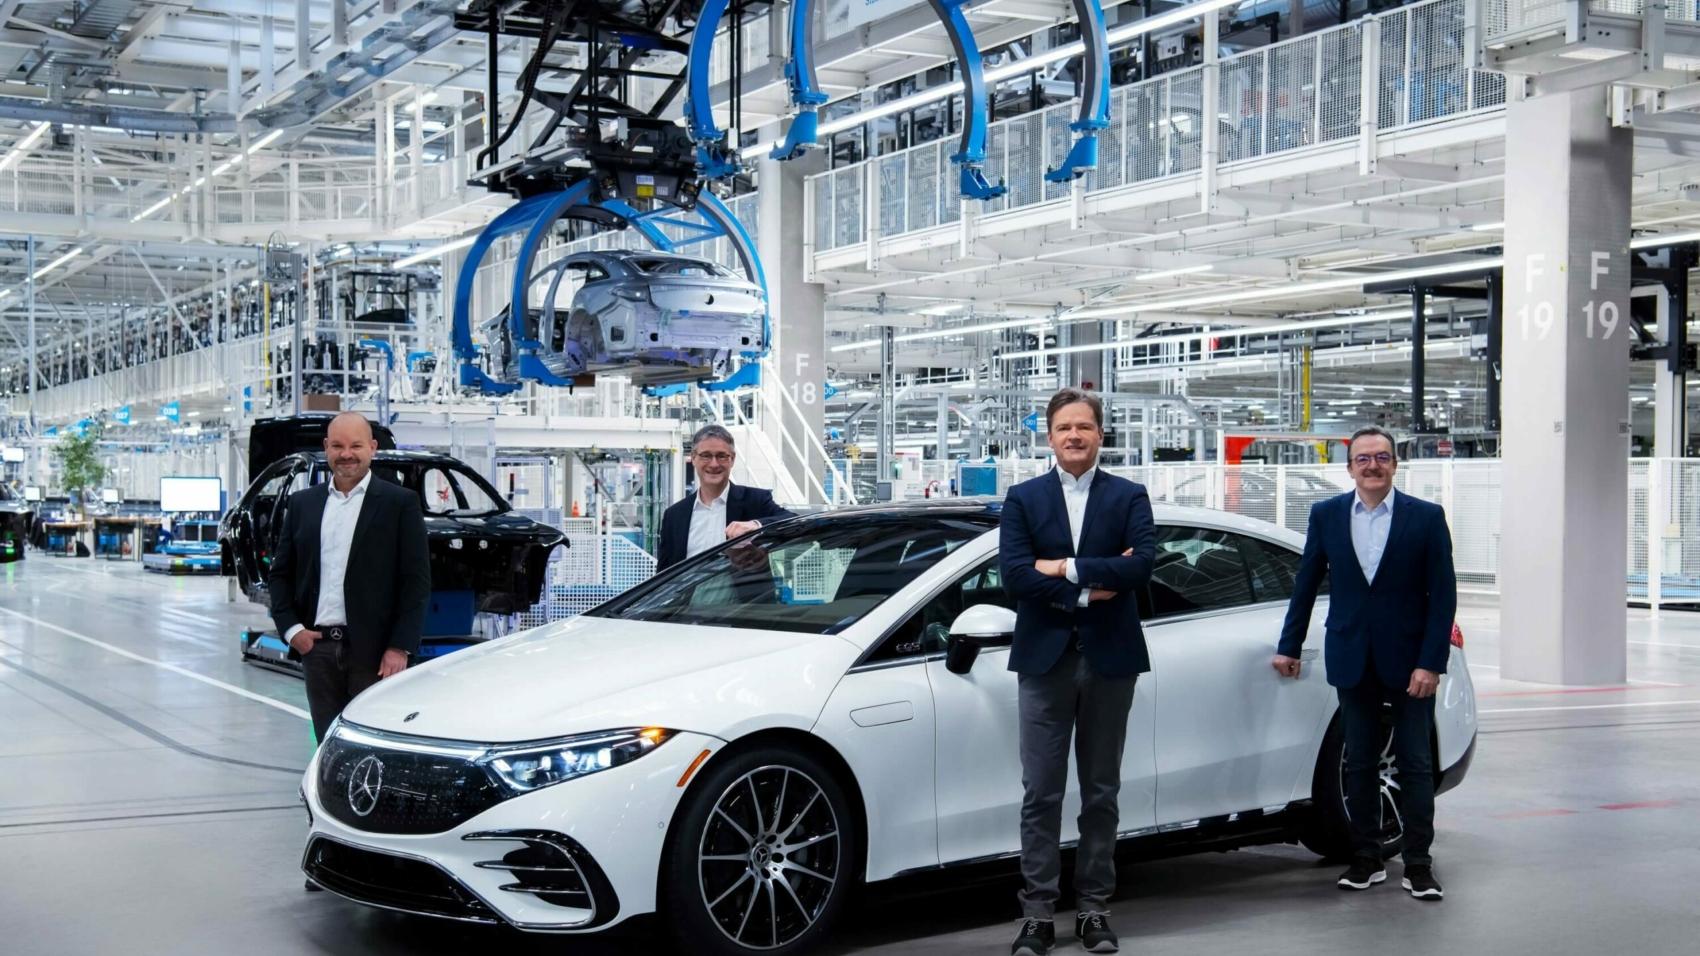 Mercedes EQS production at Factory 56